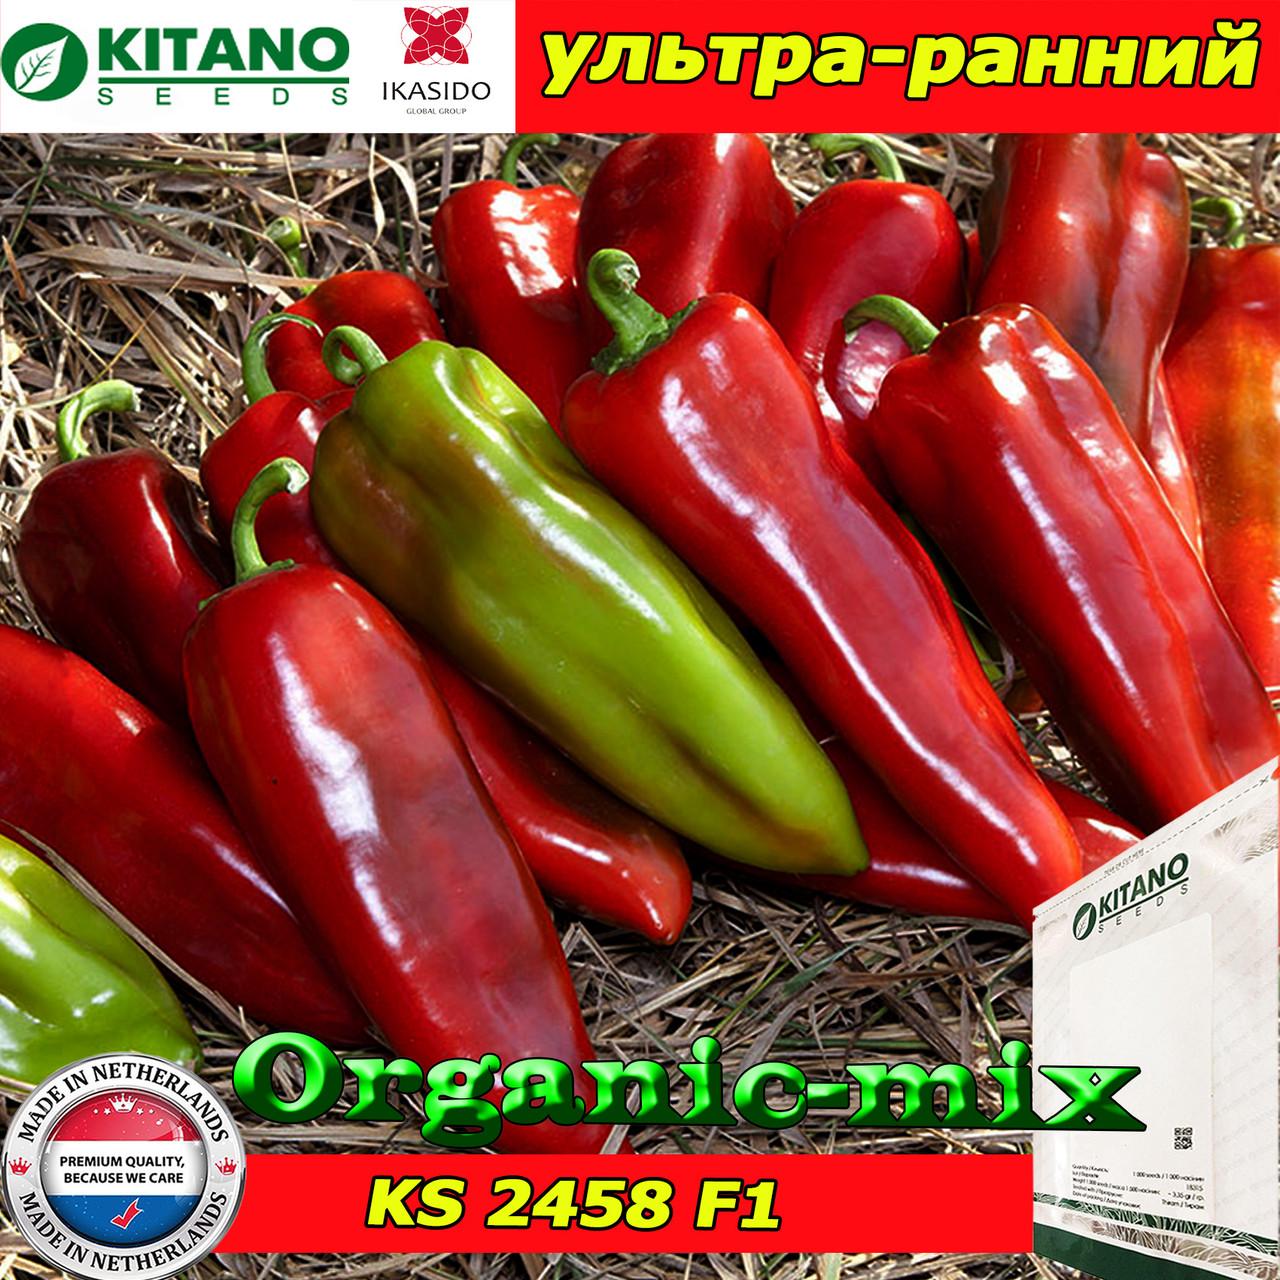 Капия KS 2458 F1, семена сладкого перца, пакет 100 семян ТМ Kitano Seeds (Нидерланды)